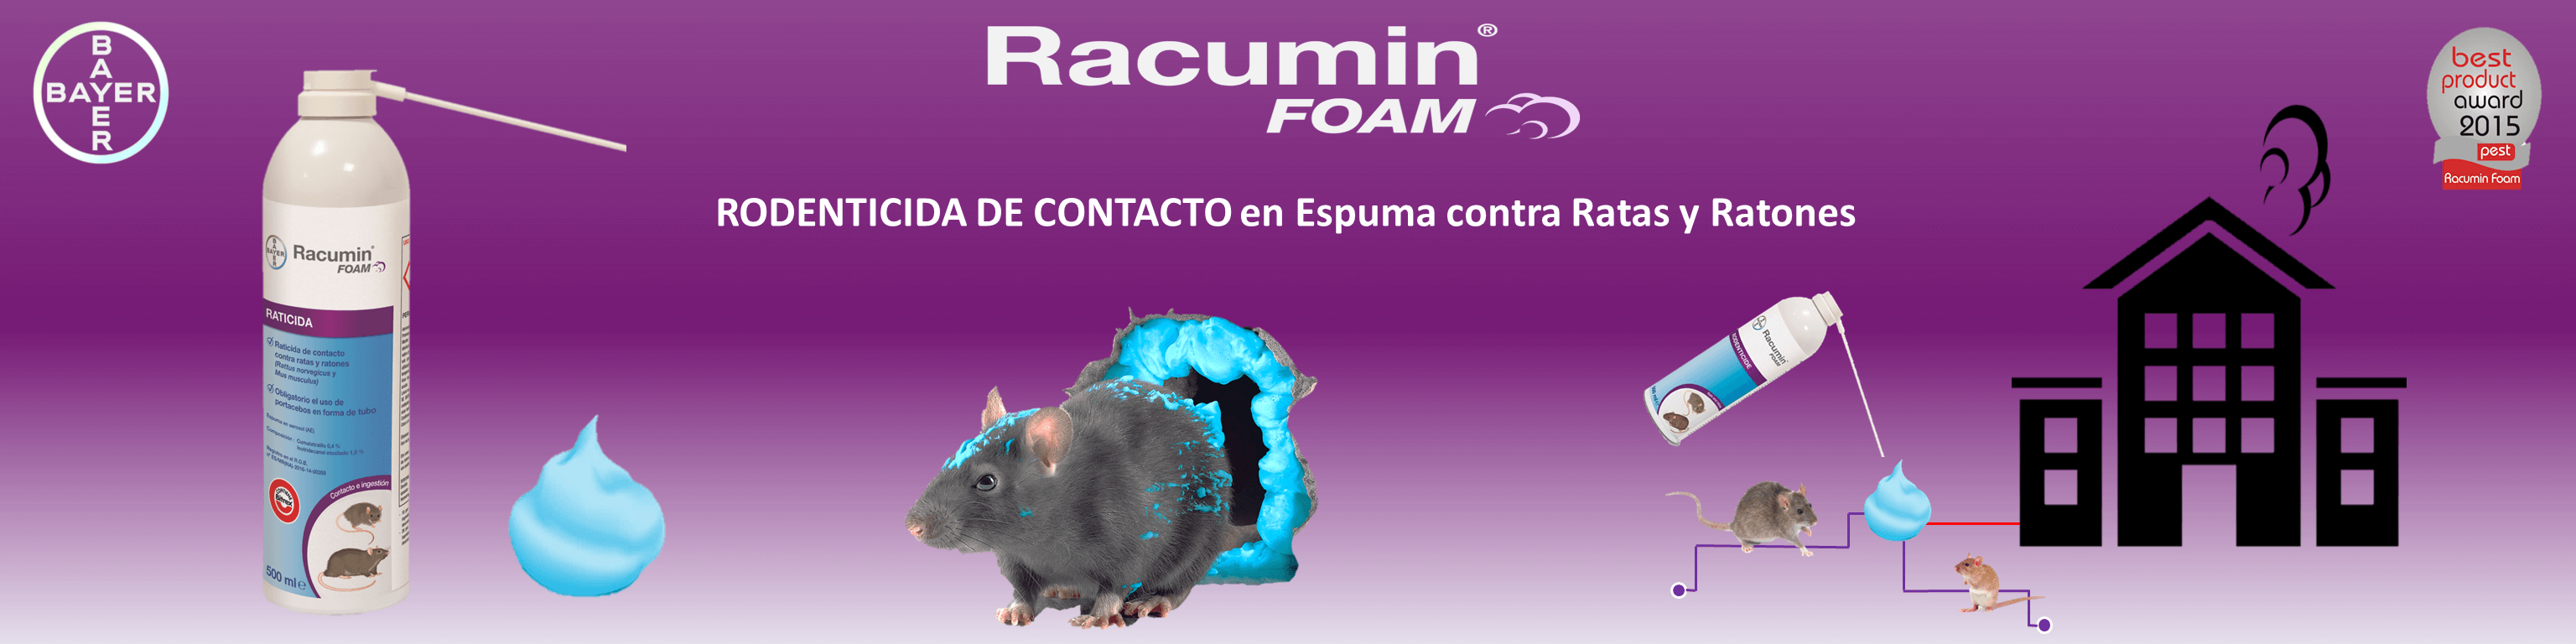 RACUMIN FOAM